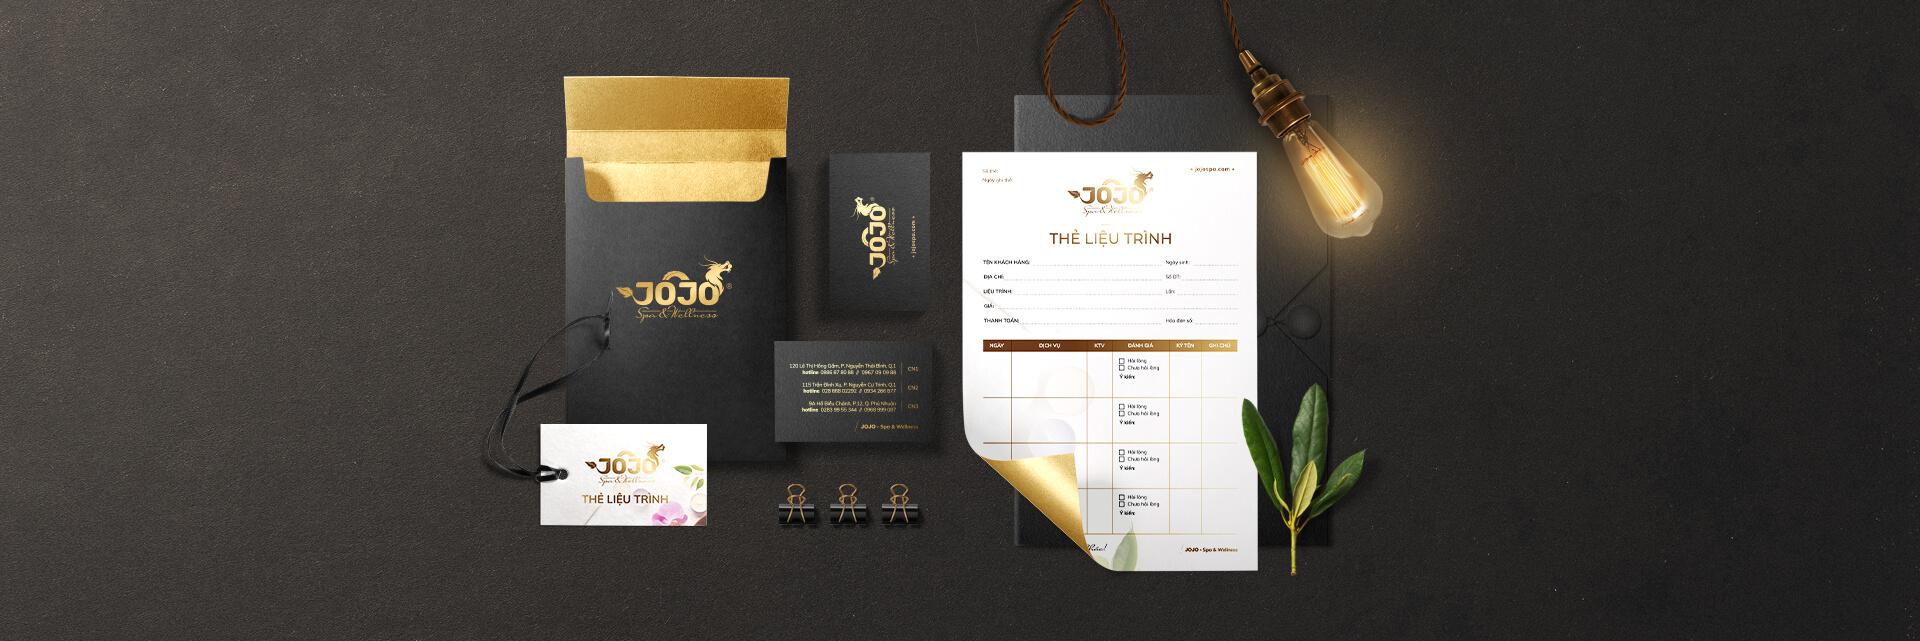 thiet-ke-logo-chuyen-nghiep-Jojo-spa-&-wellness-14